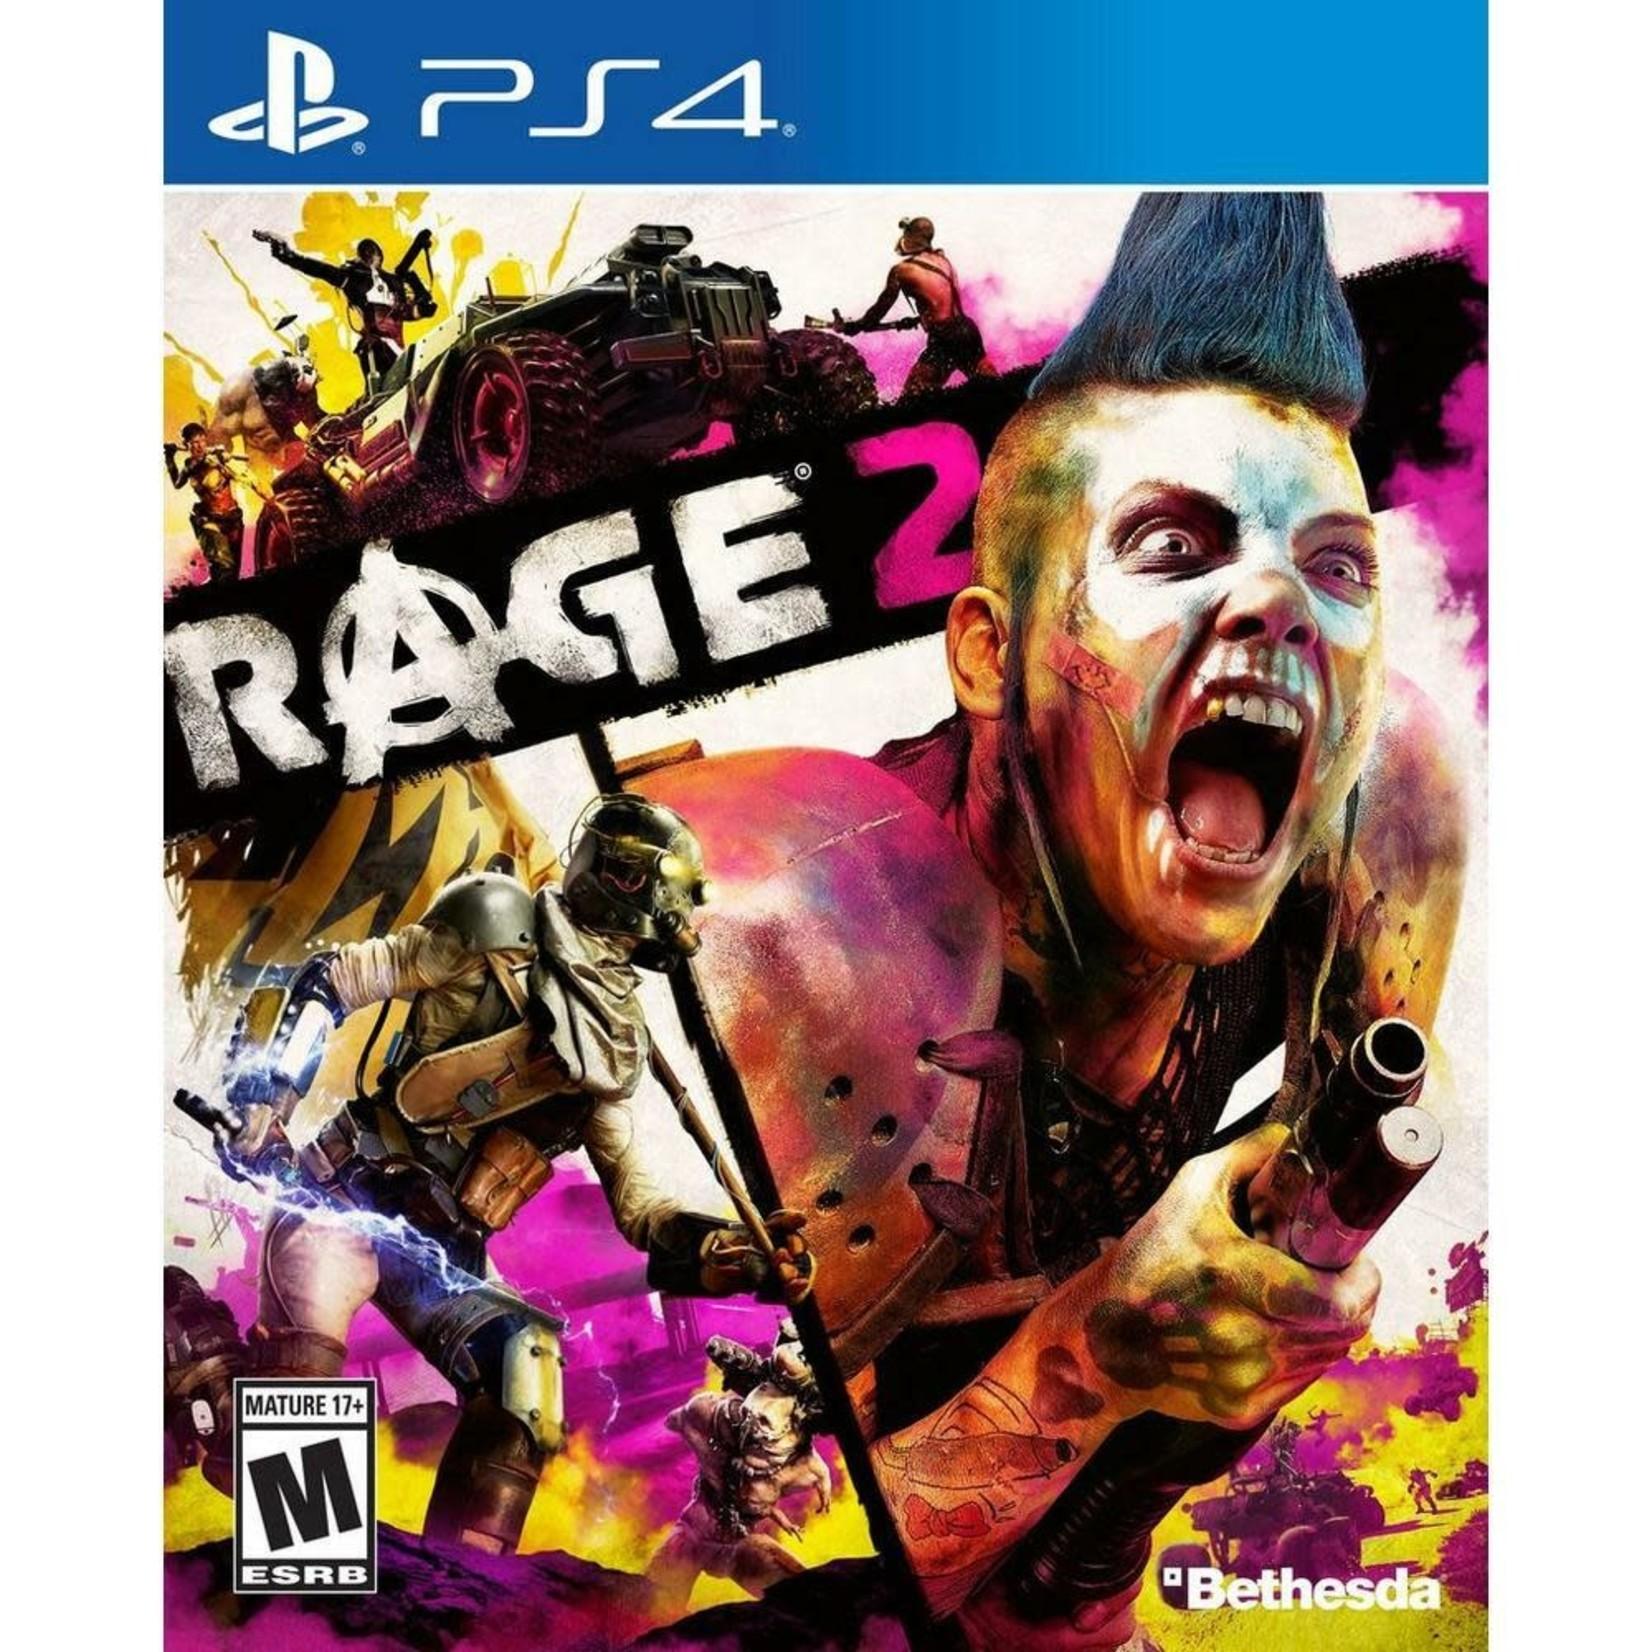 PS4-Rage 2